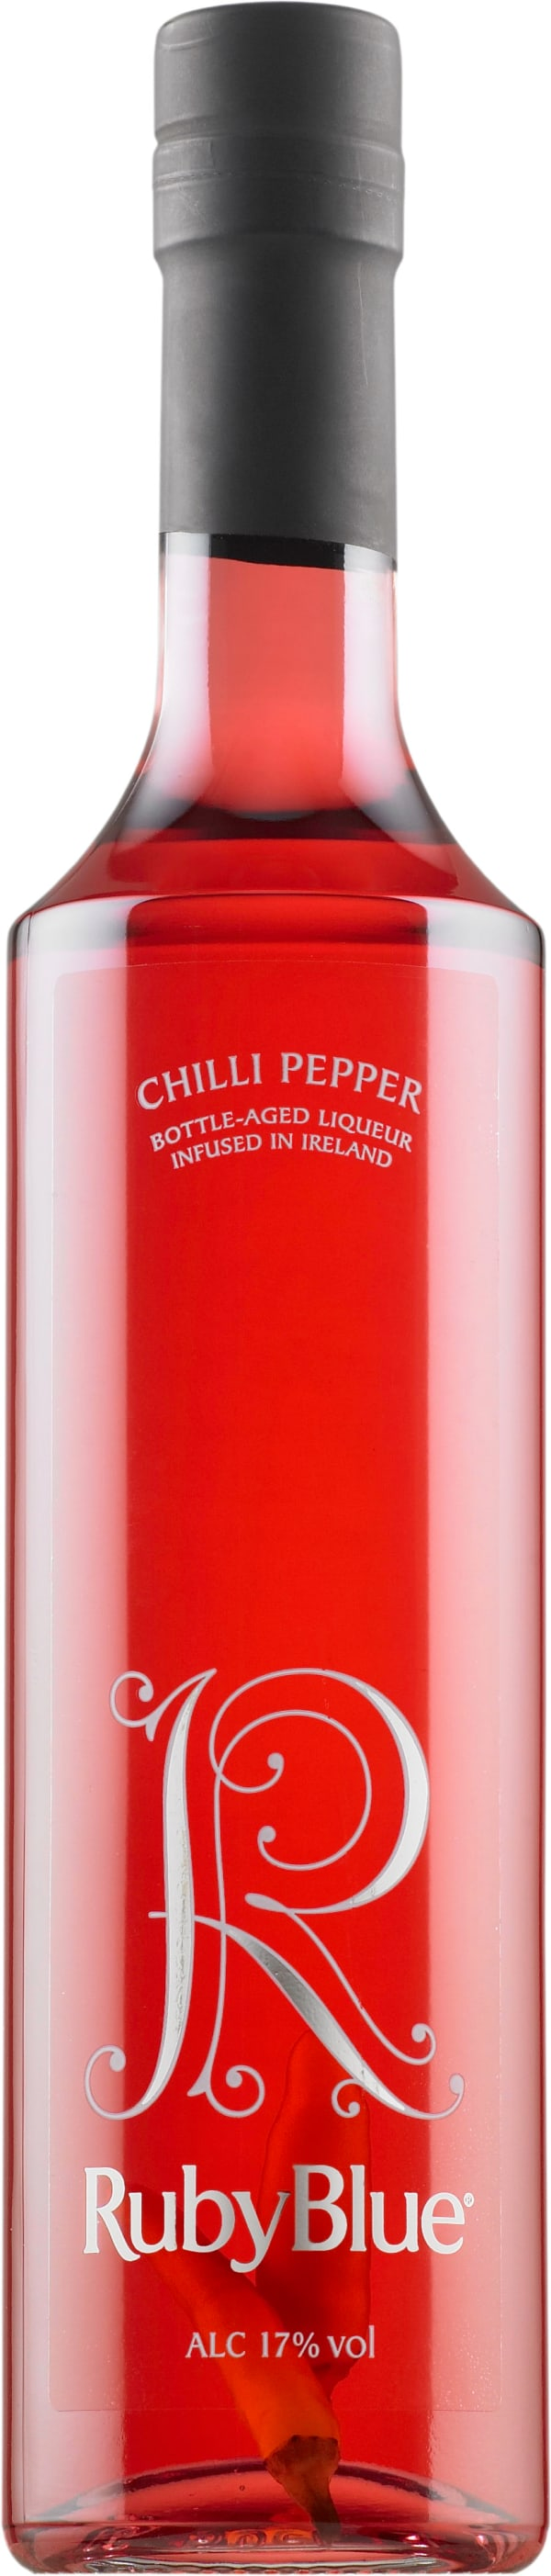 RubyBlue Chilli Pepper